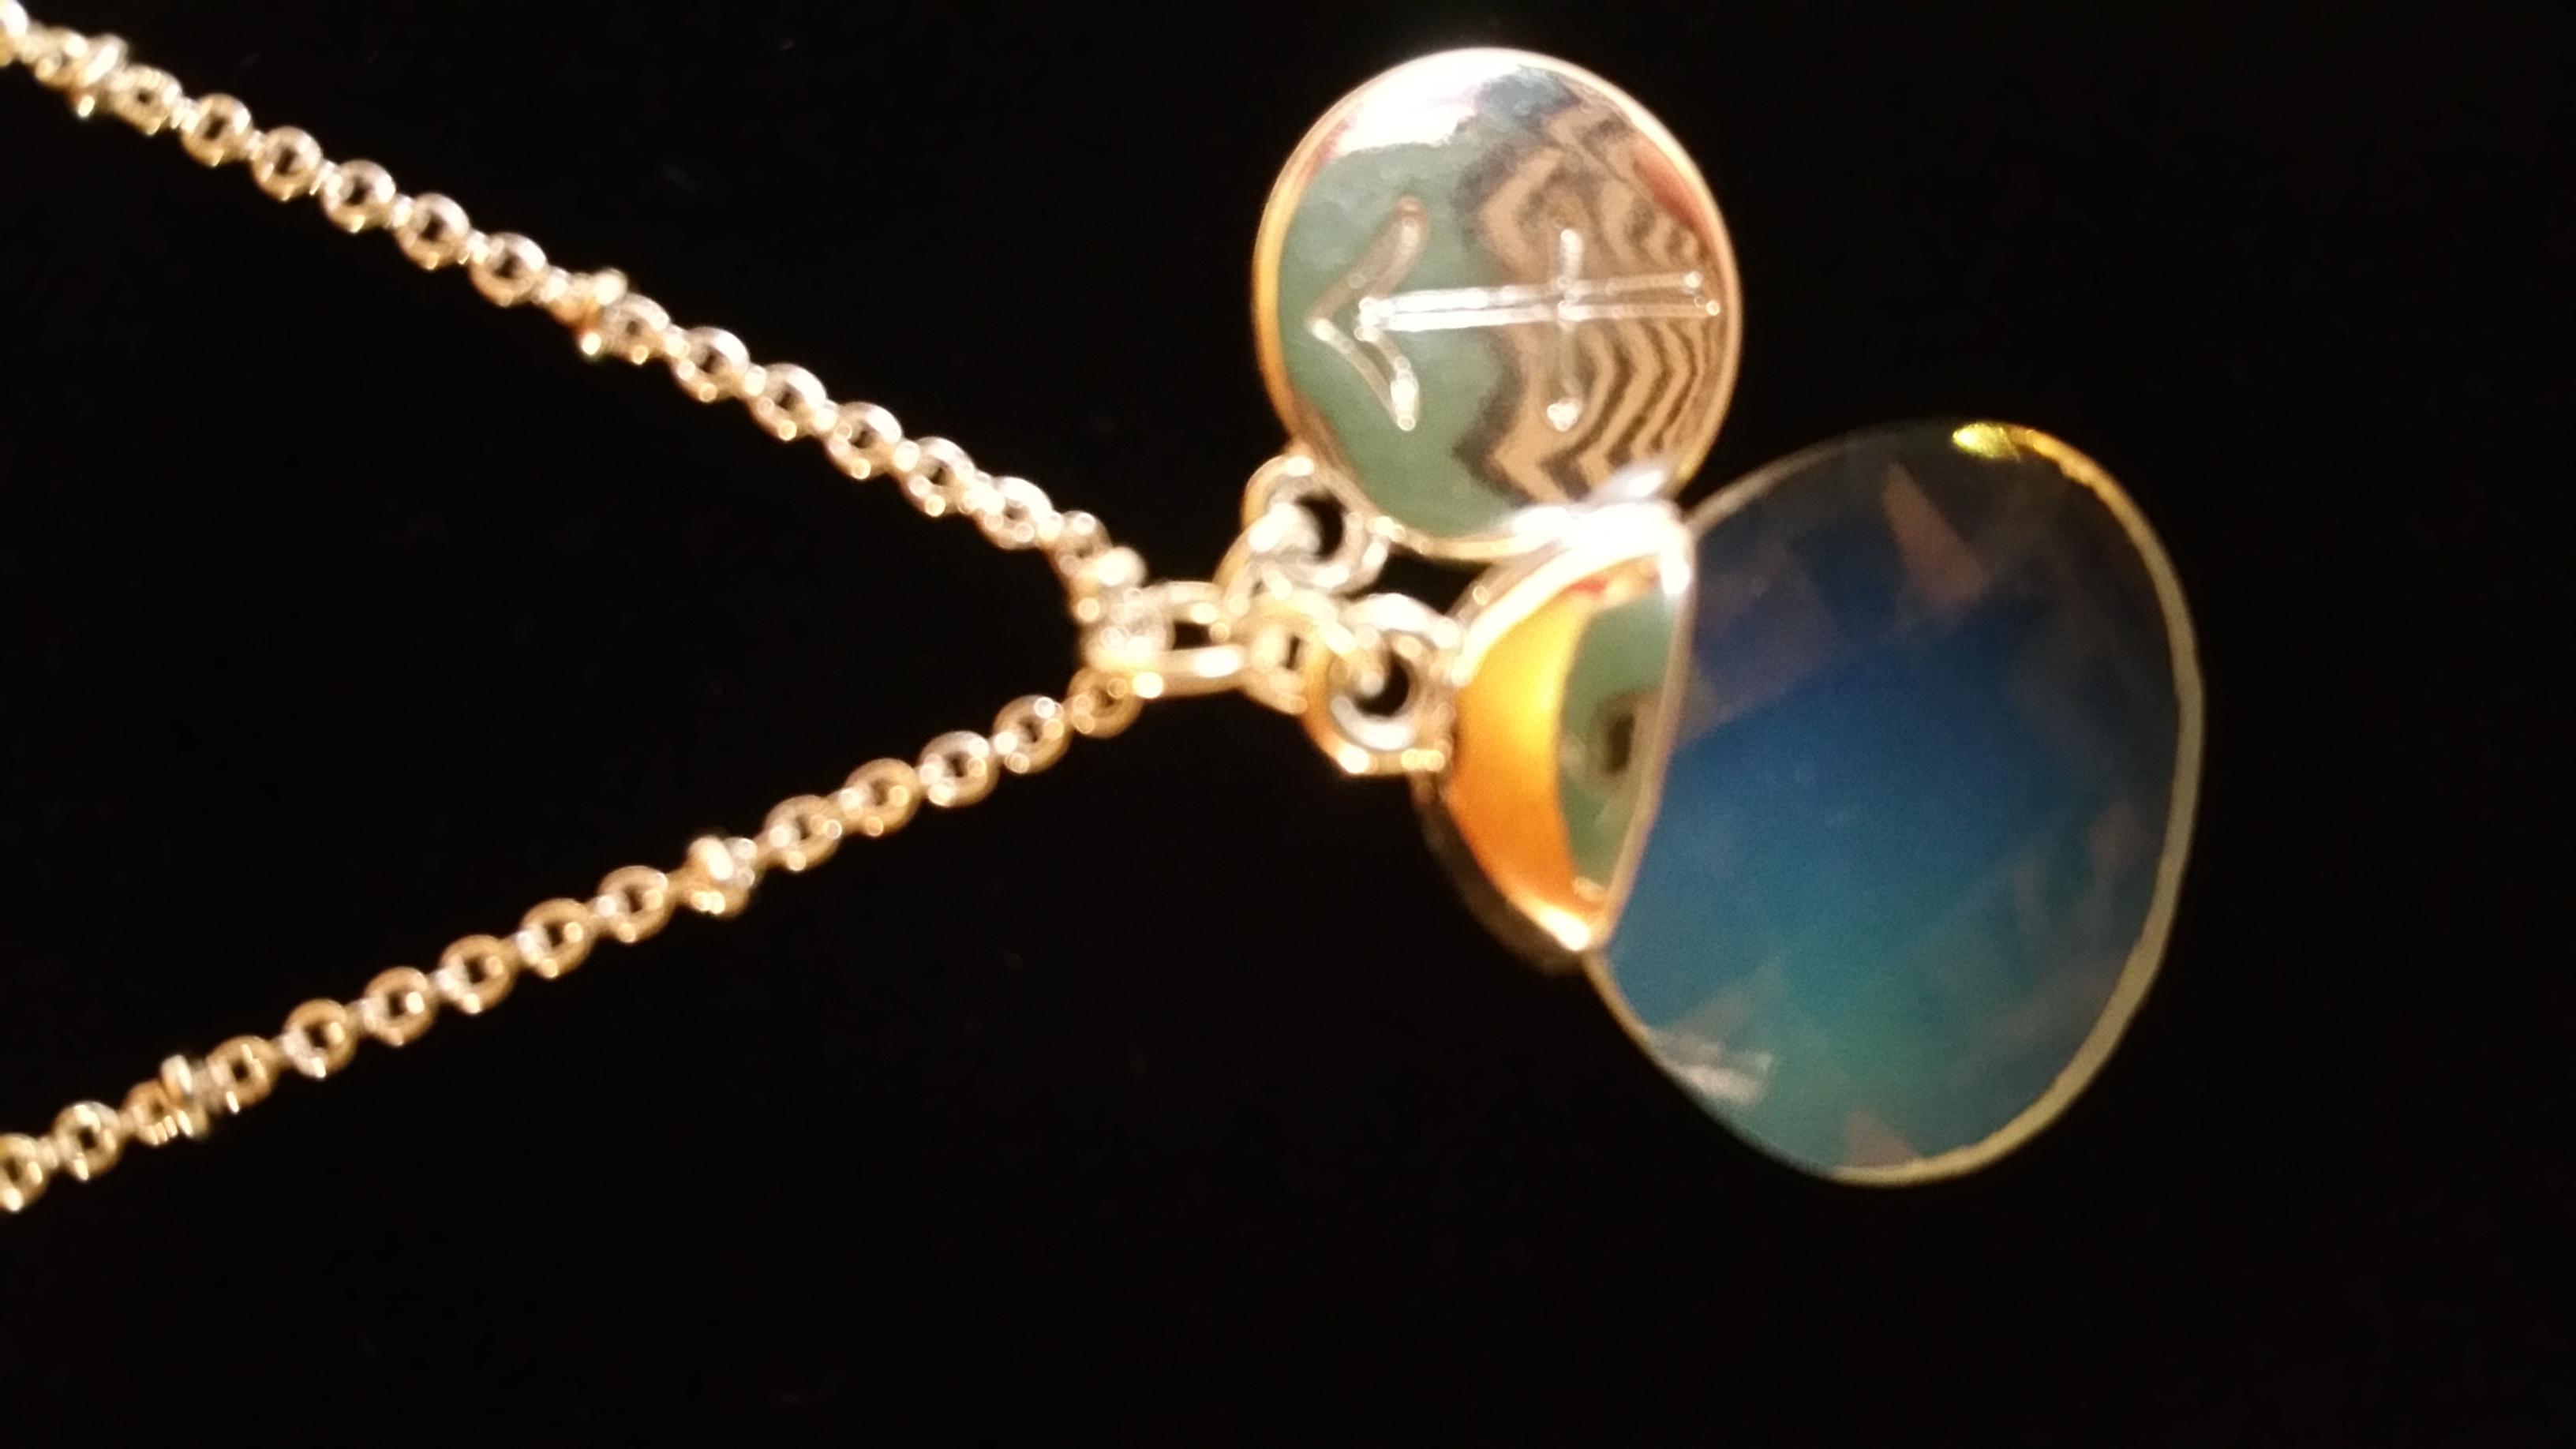 sagittarius zodiac pendant necklace 183 shoppingfrenzy4u